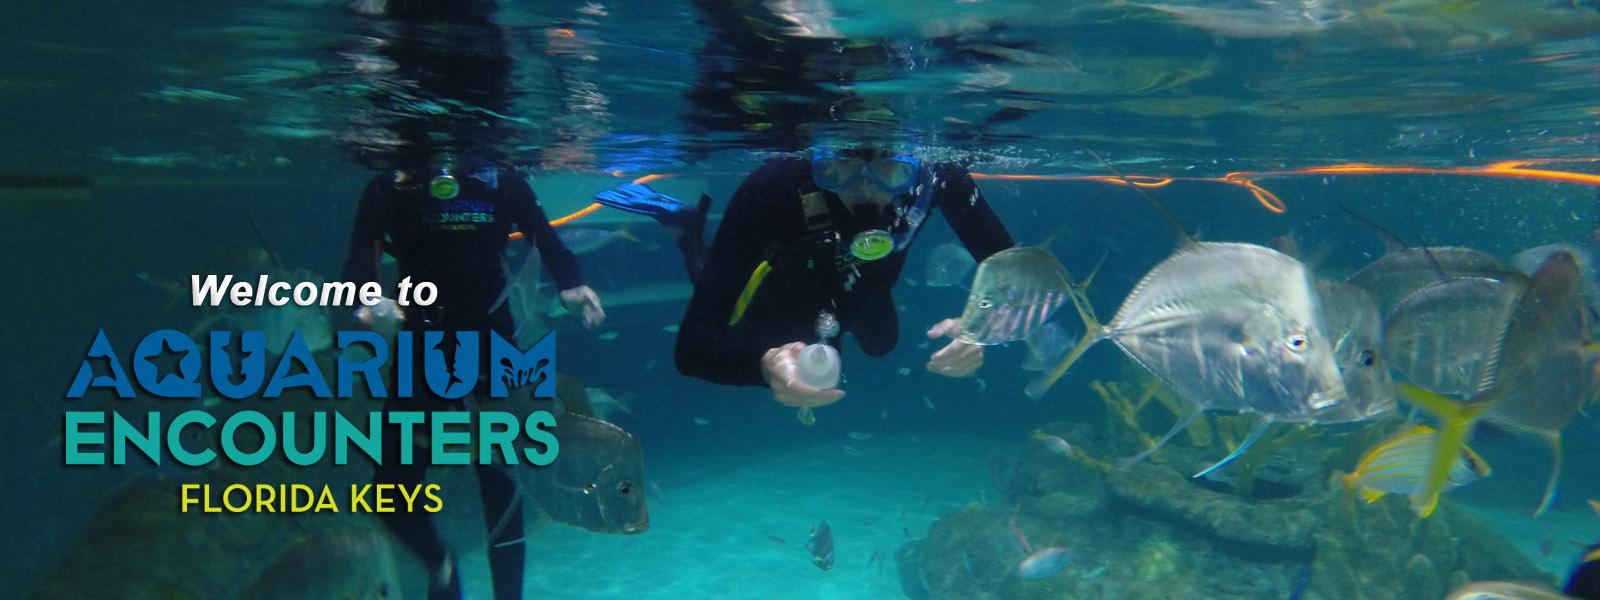 florida keys aquarium encounters immerse yourself in the